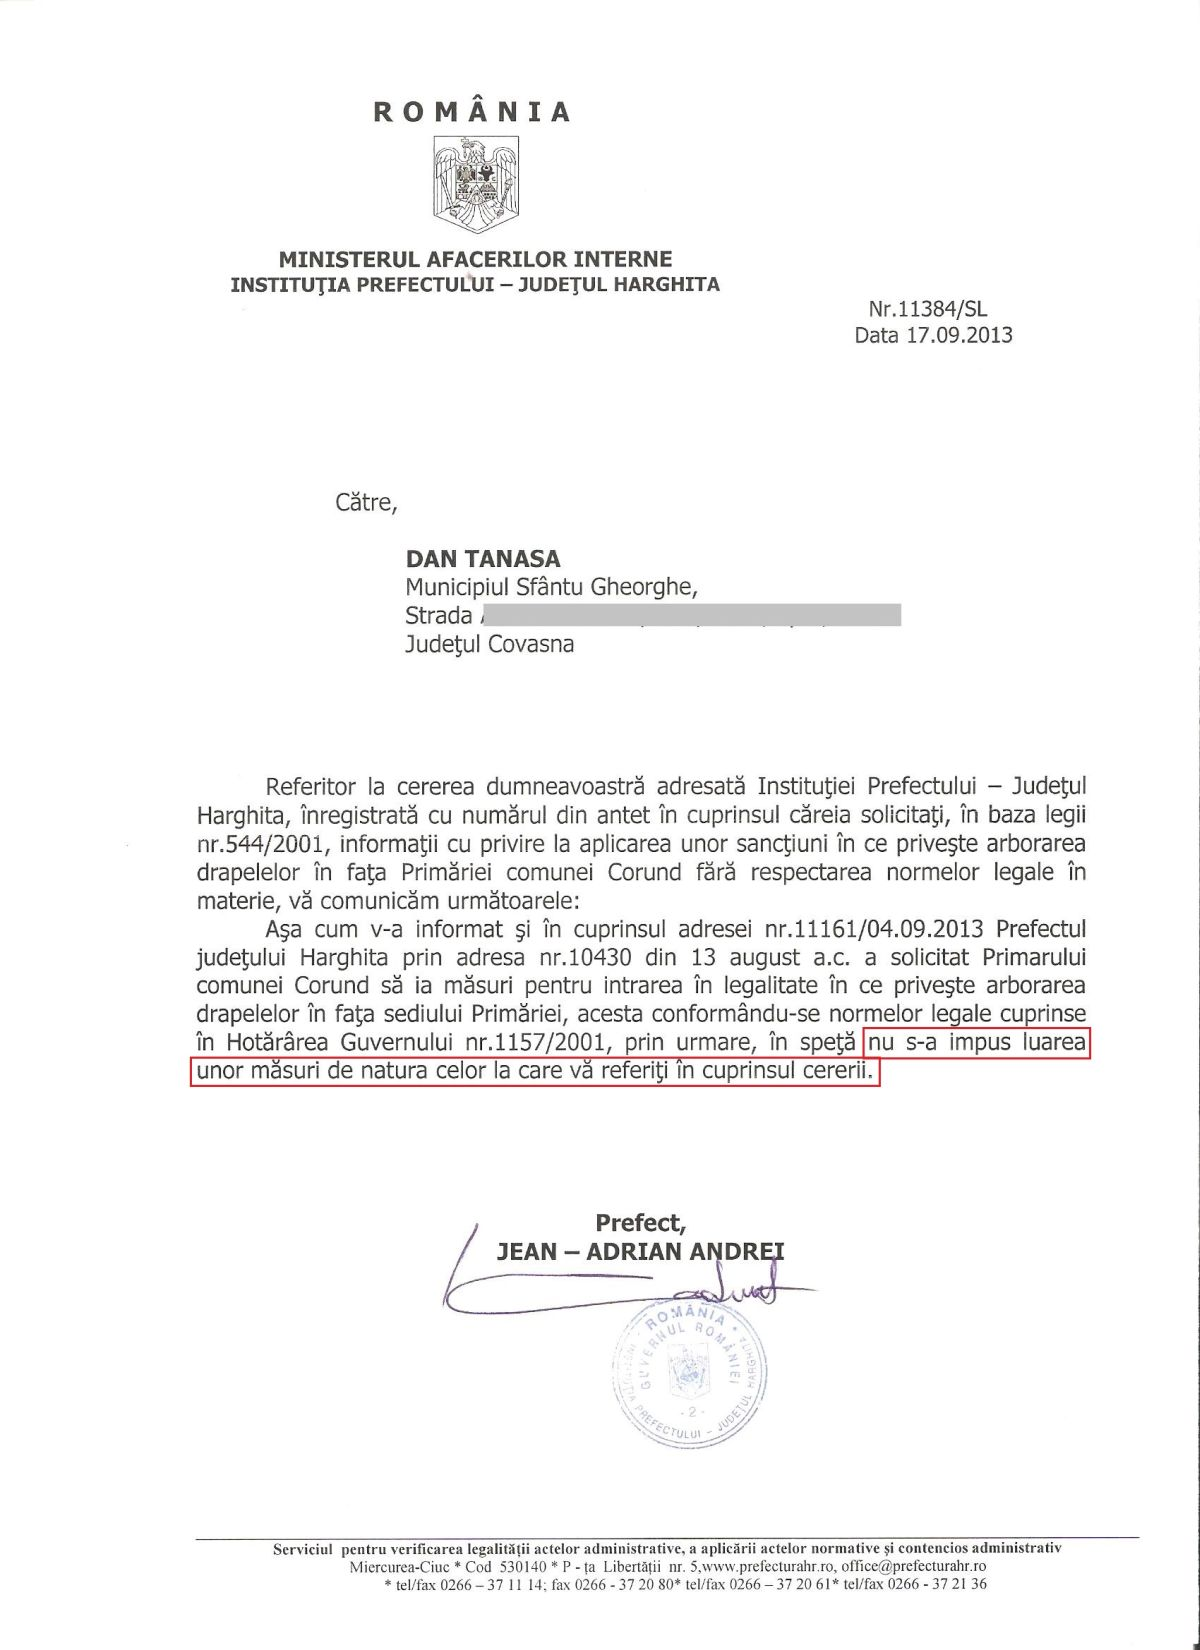 Prefect Jean-Adrian Andrei drapel Ungaria Primaria Corund Dan Tanasa